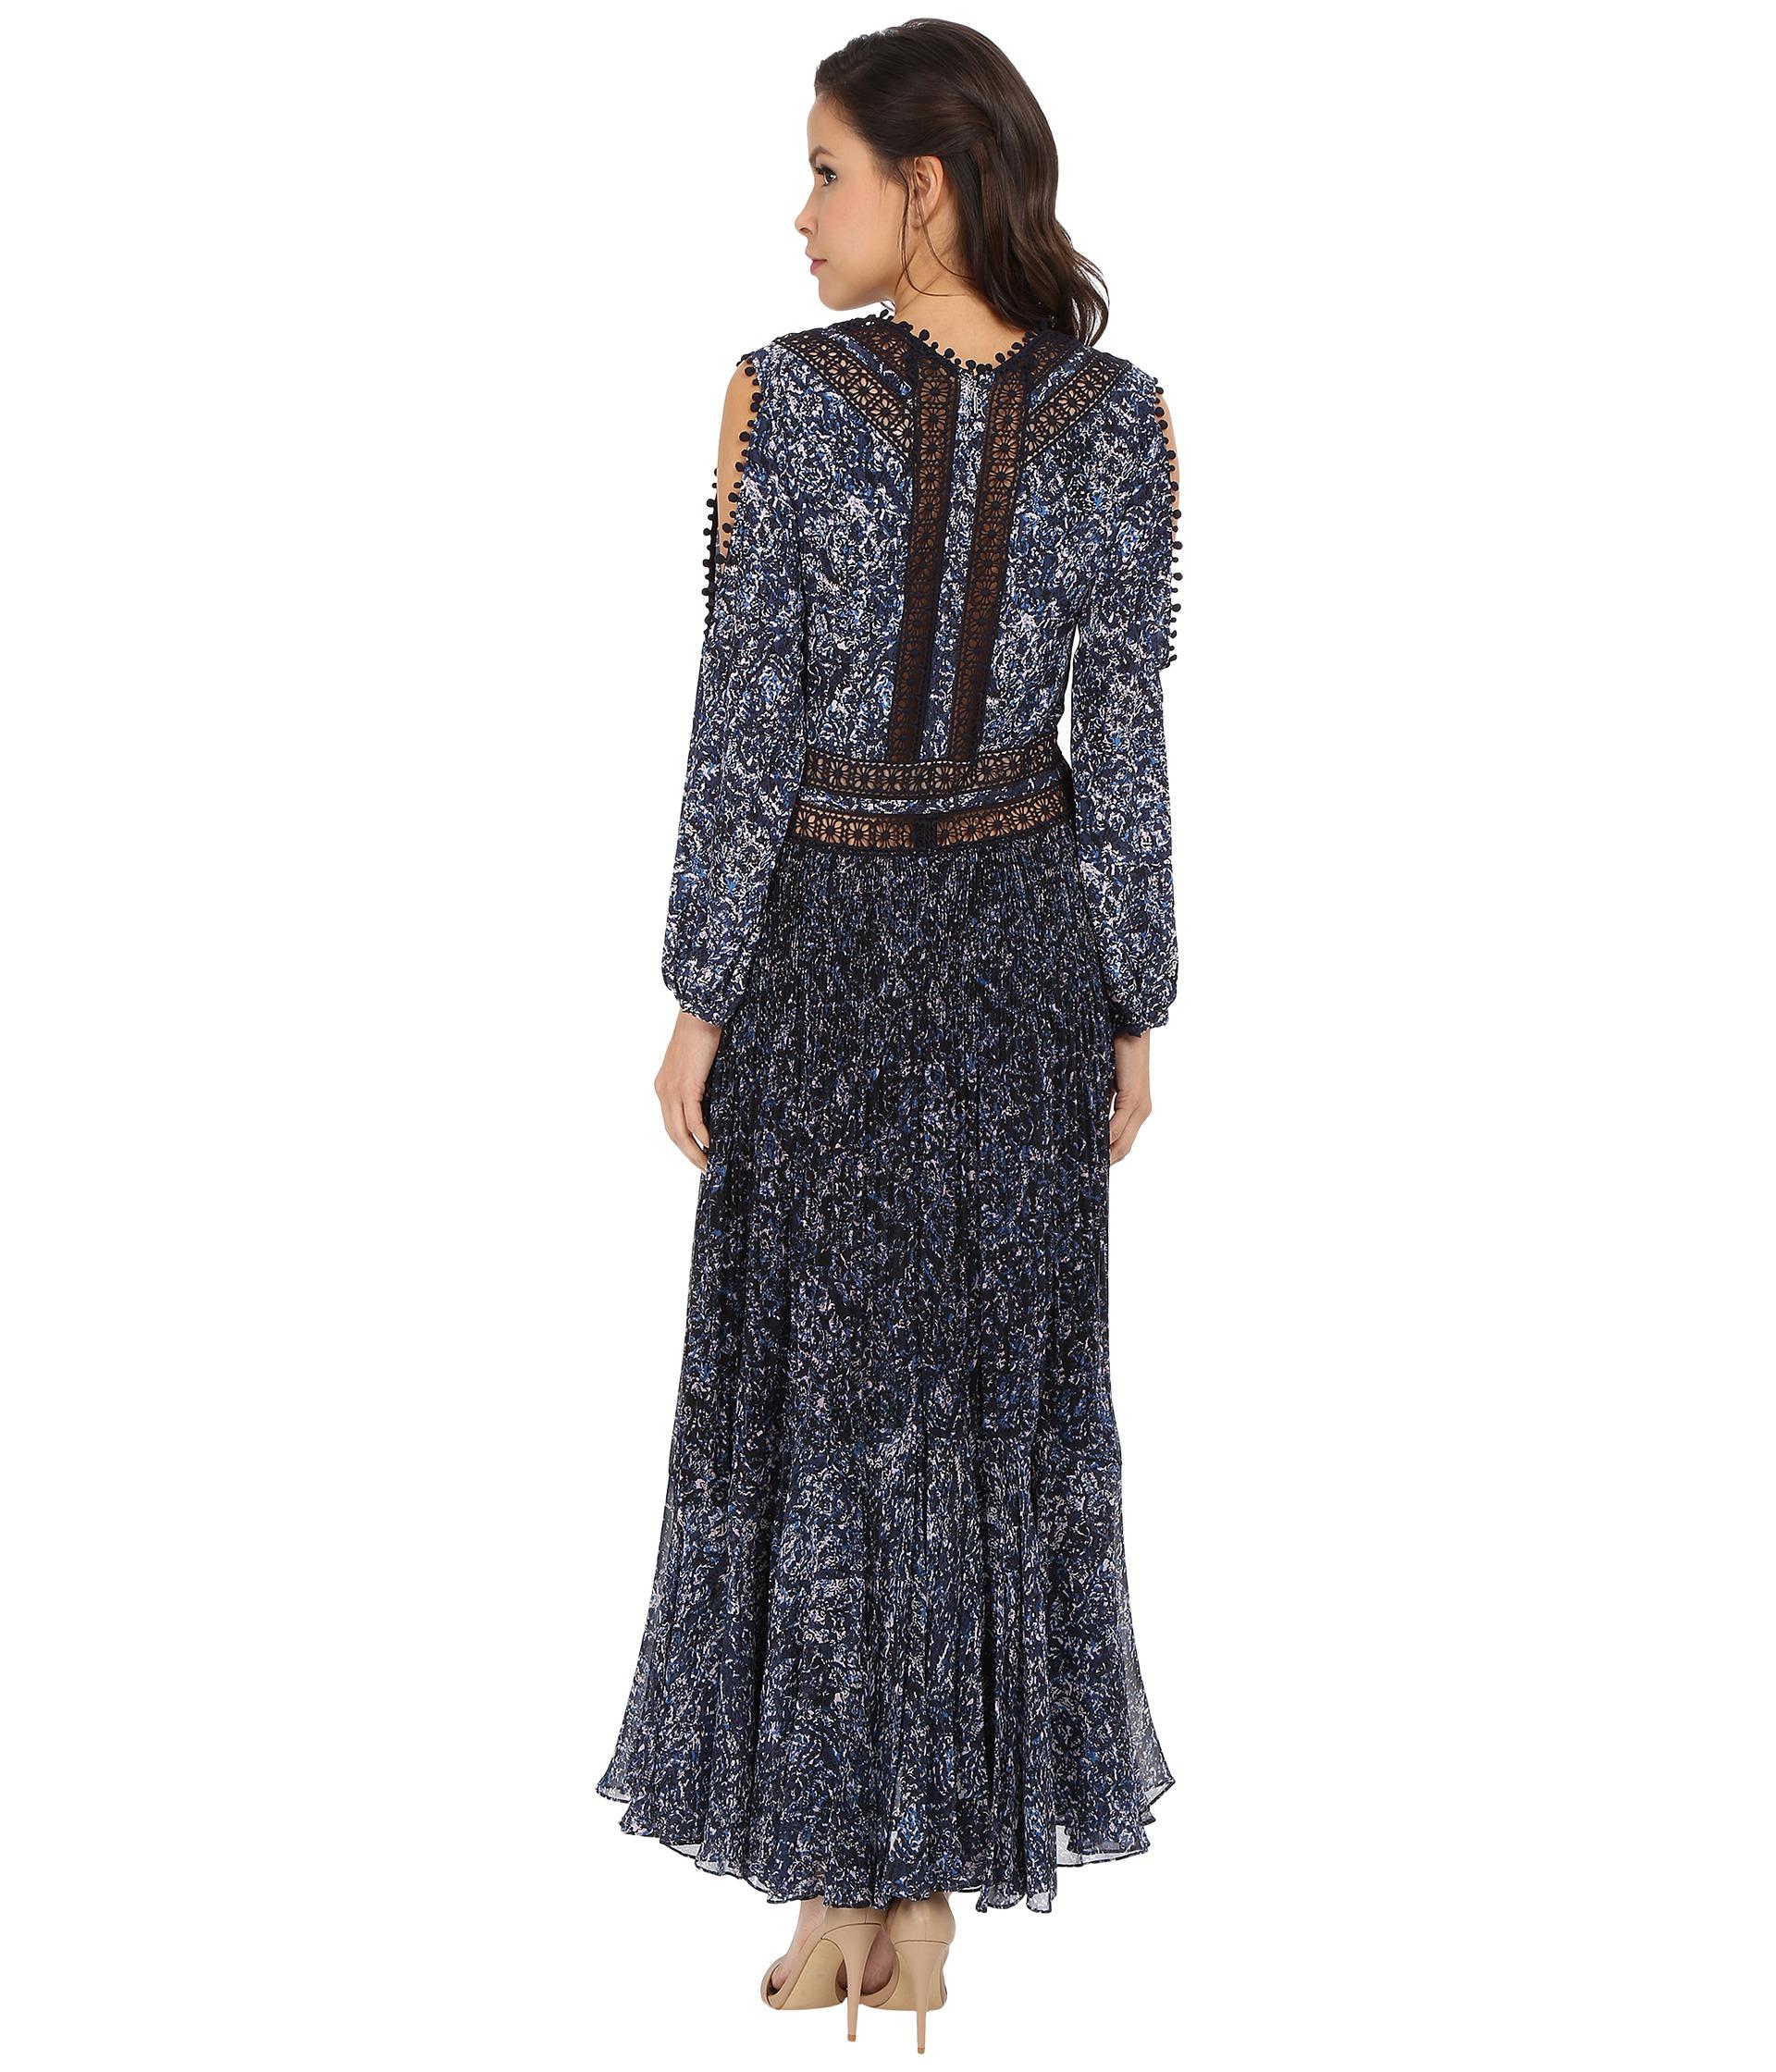 Lyst - Rebecca Taylor Block Print Paisley Maxi Dress in Blue